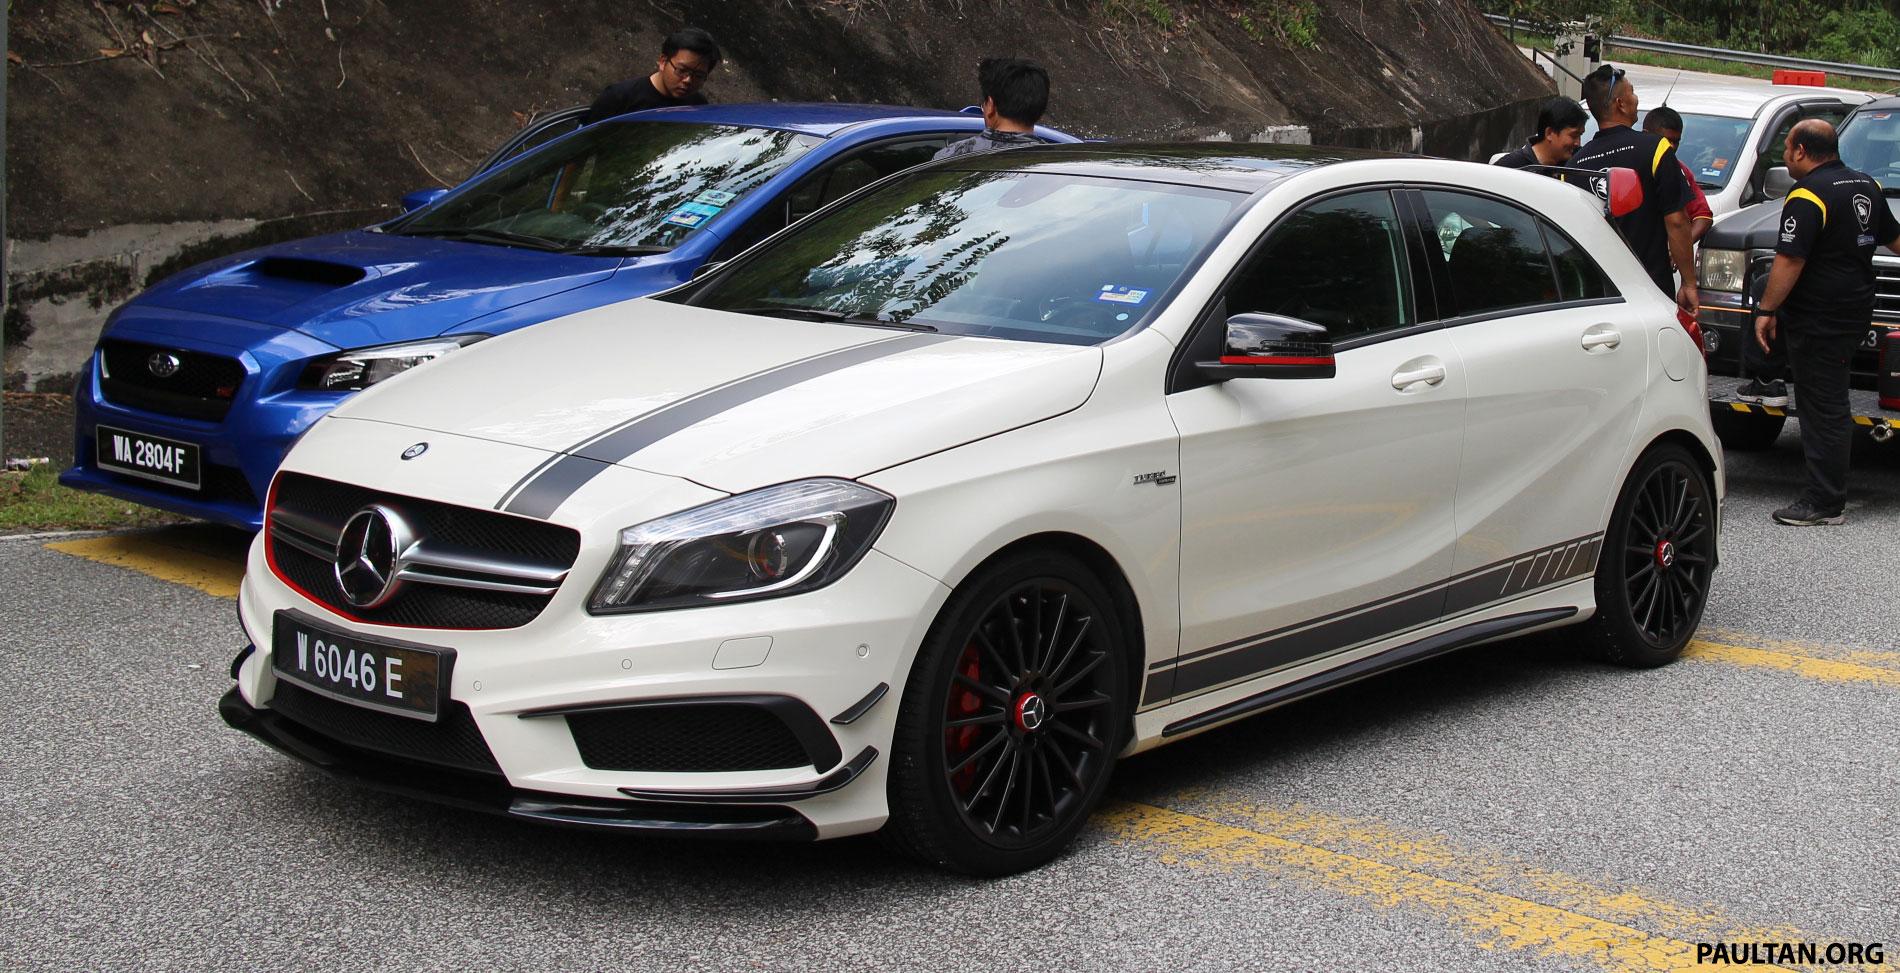 Driven Web Series 2014 #4: Horsepower assault – Mercedes A 45 AMG vs VW Golf R vs Subaru WRX STI